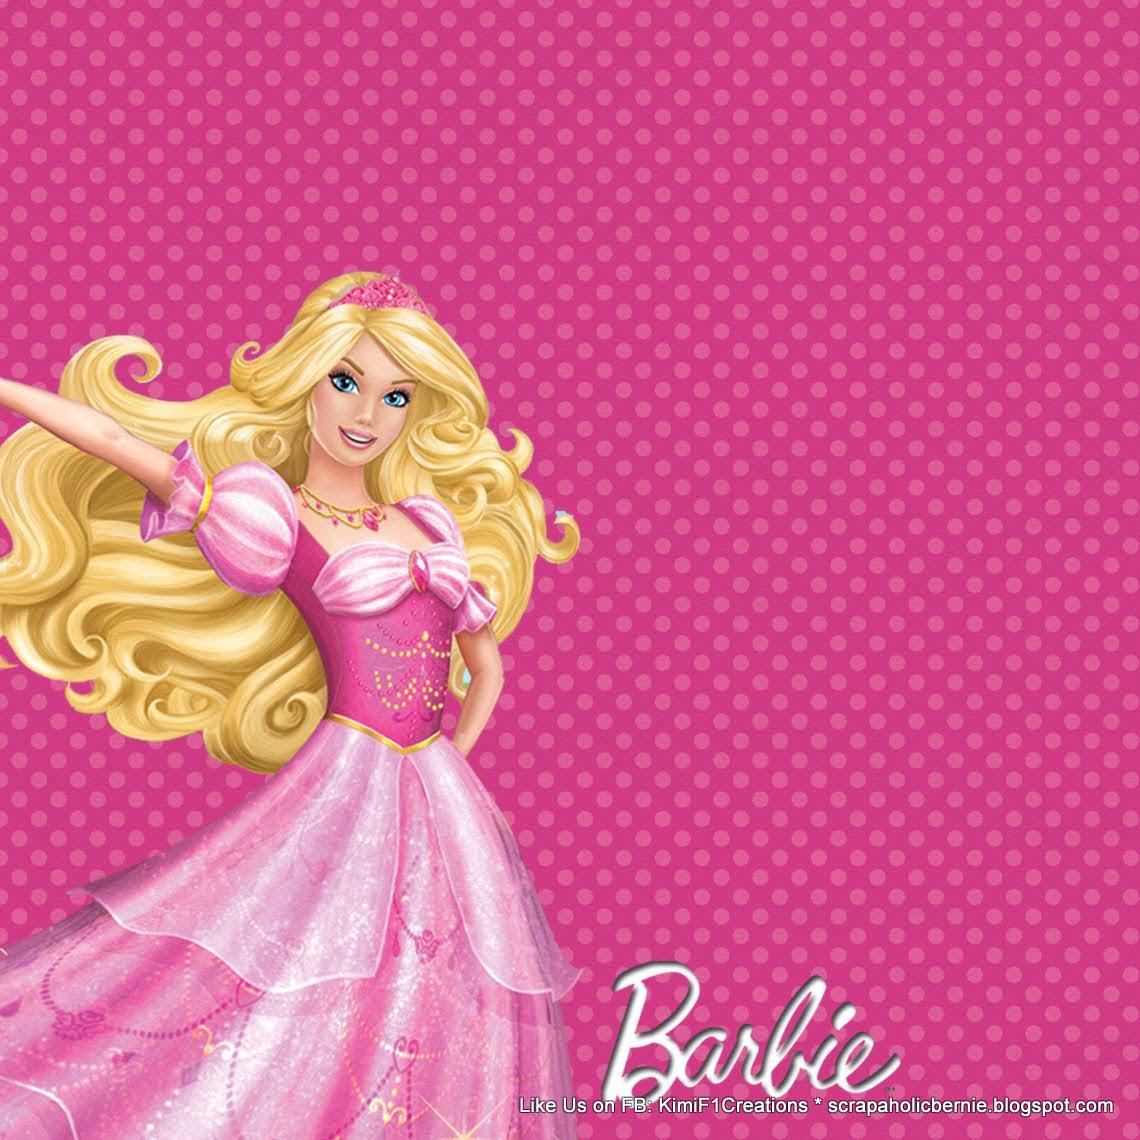 Barbie Birthday Invitations Barbie Birthday Invitations This Is